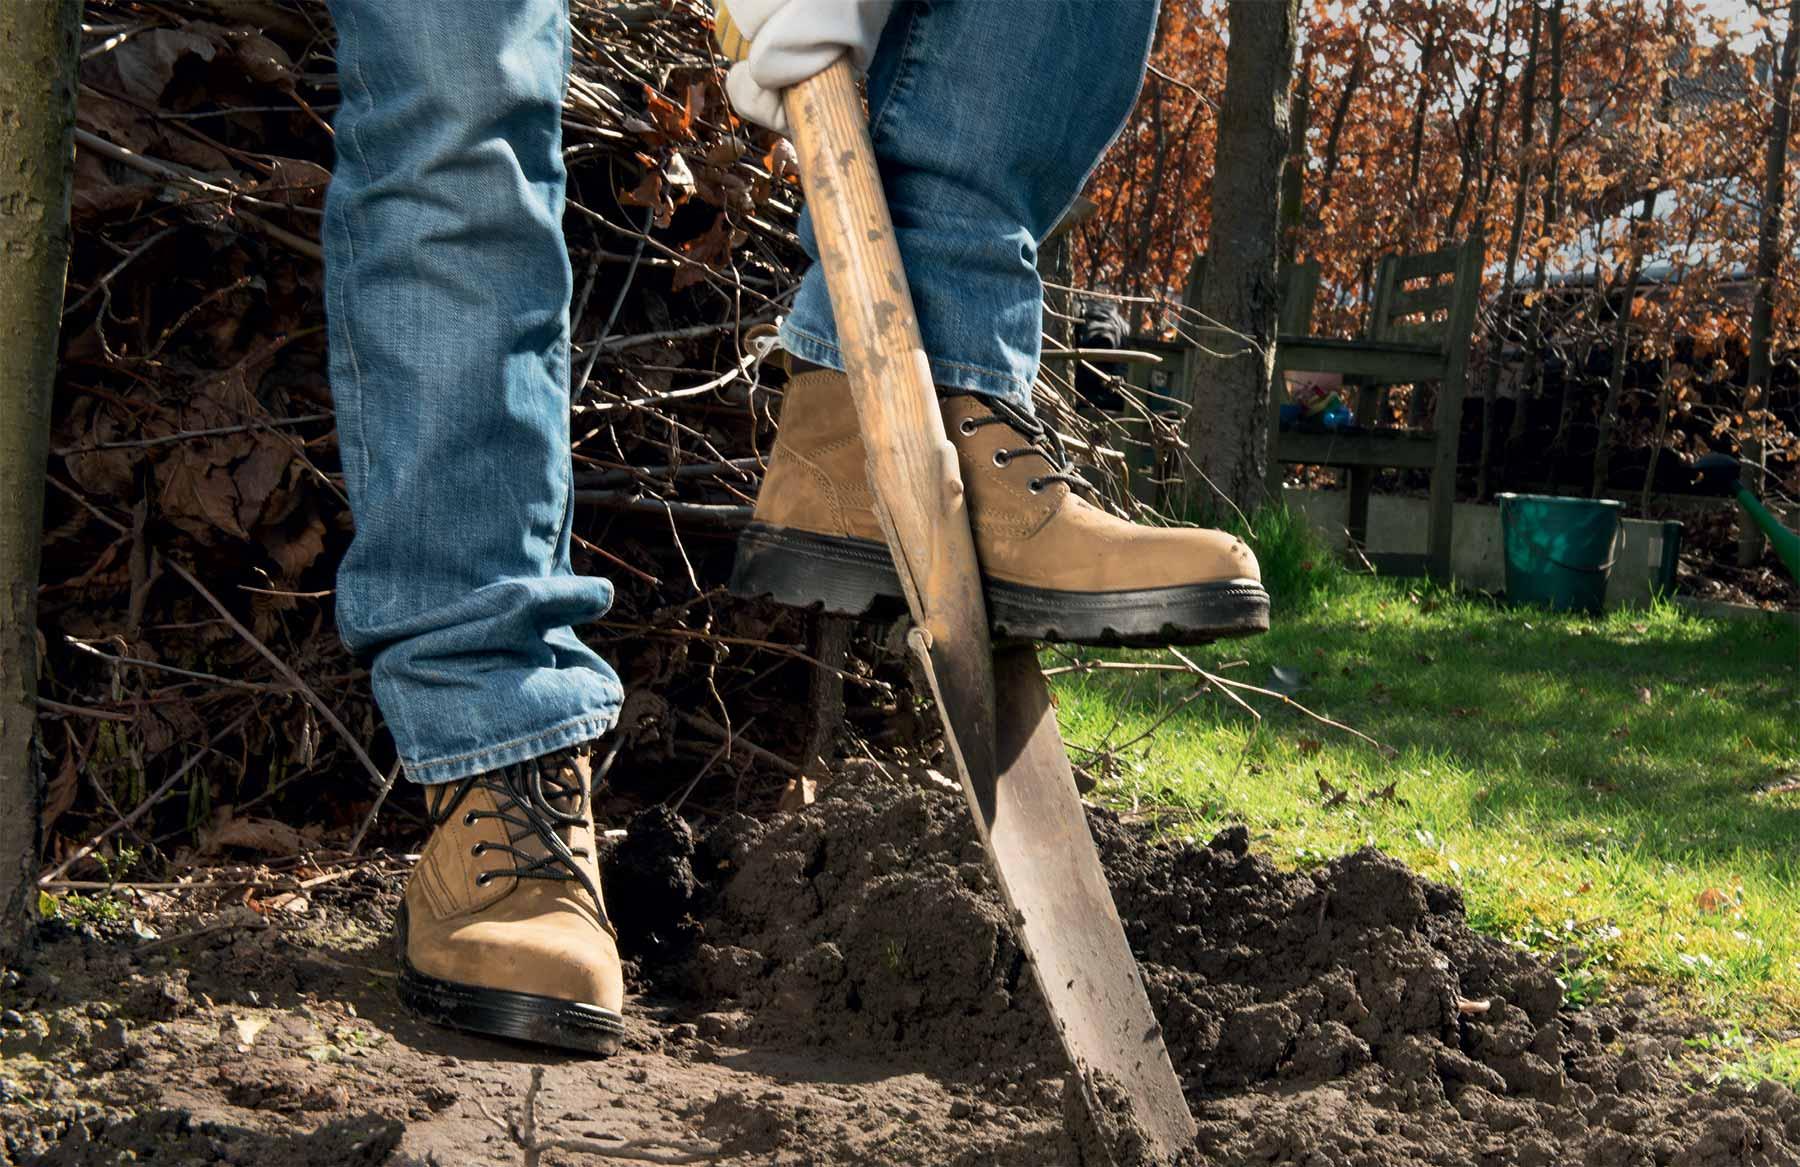 tuinieren werkschoenen - chaussures de sécurité - work shoes